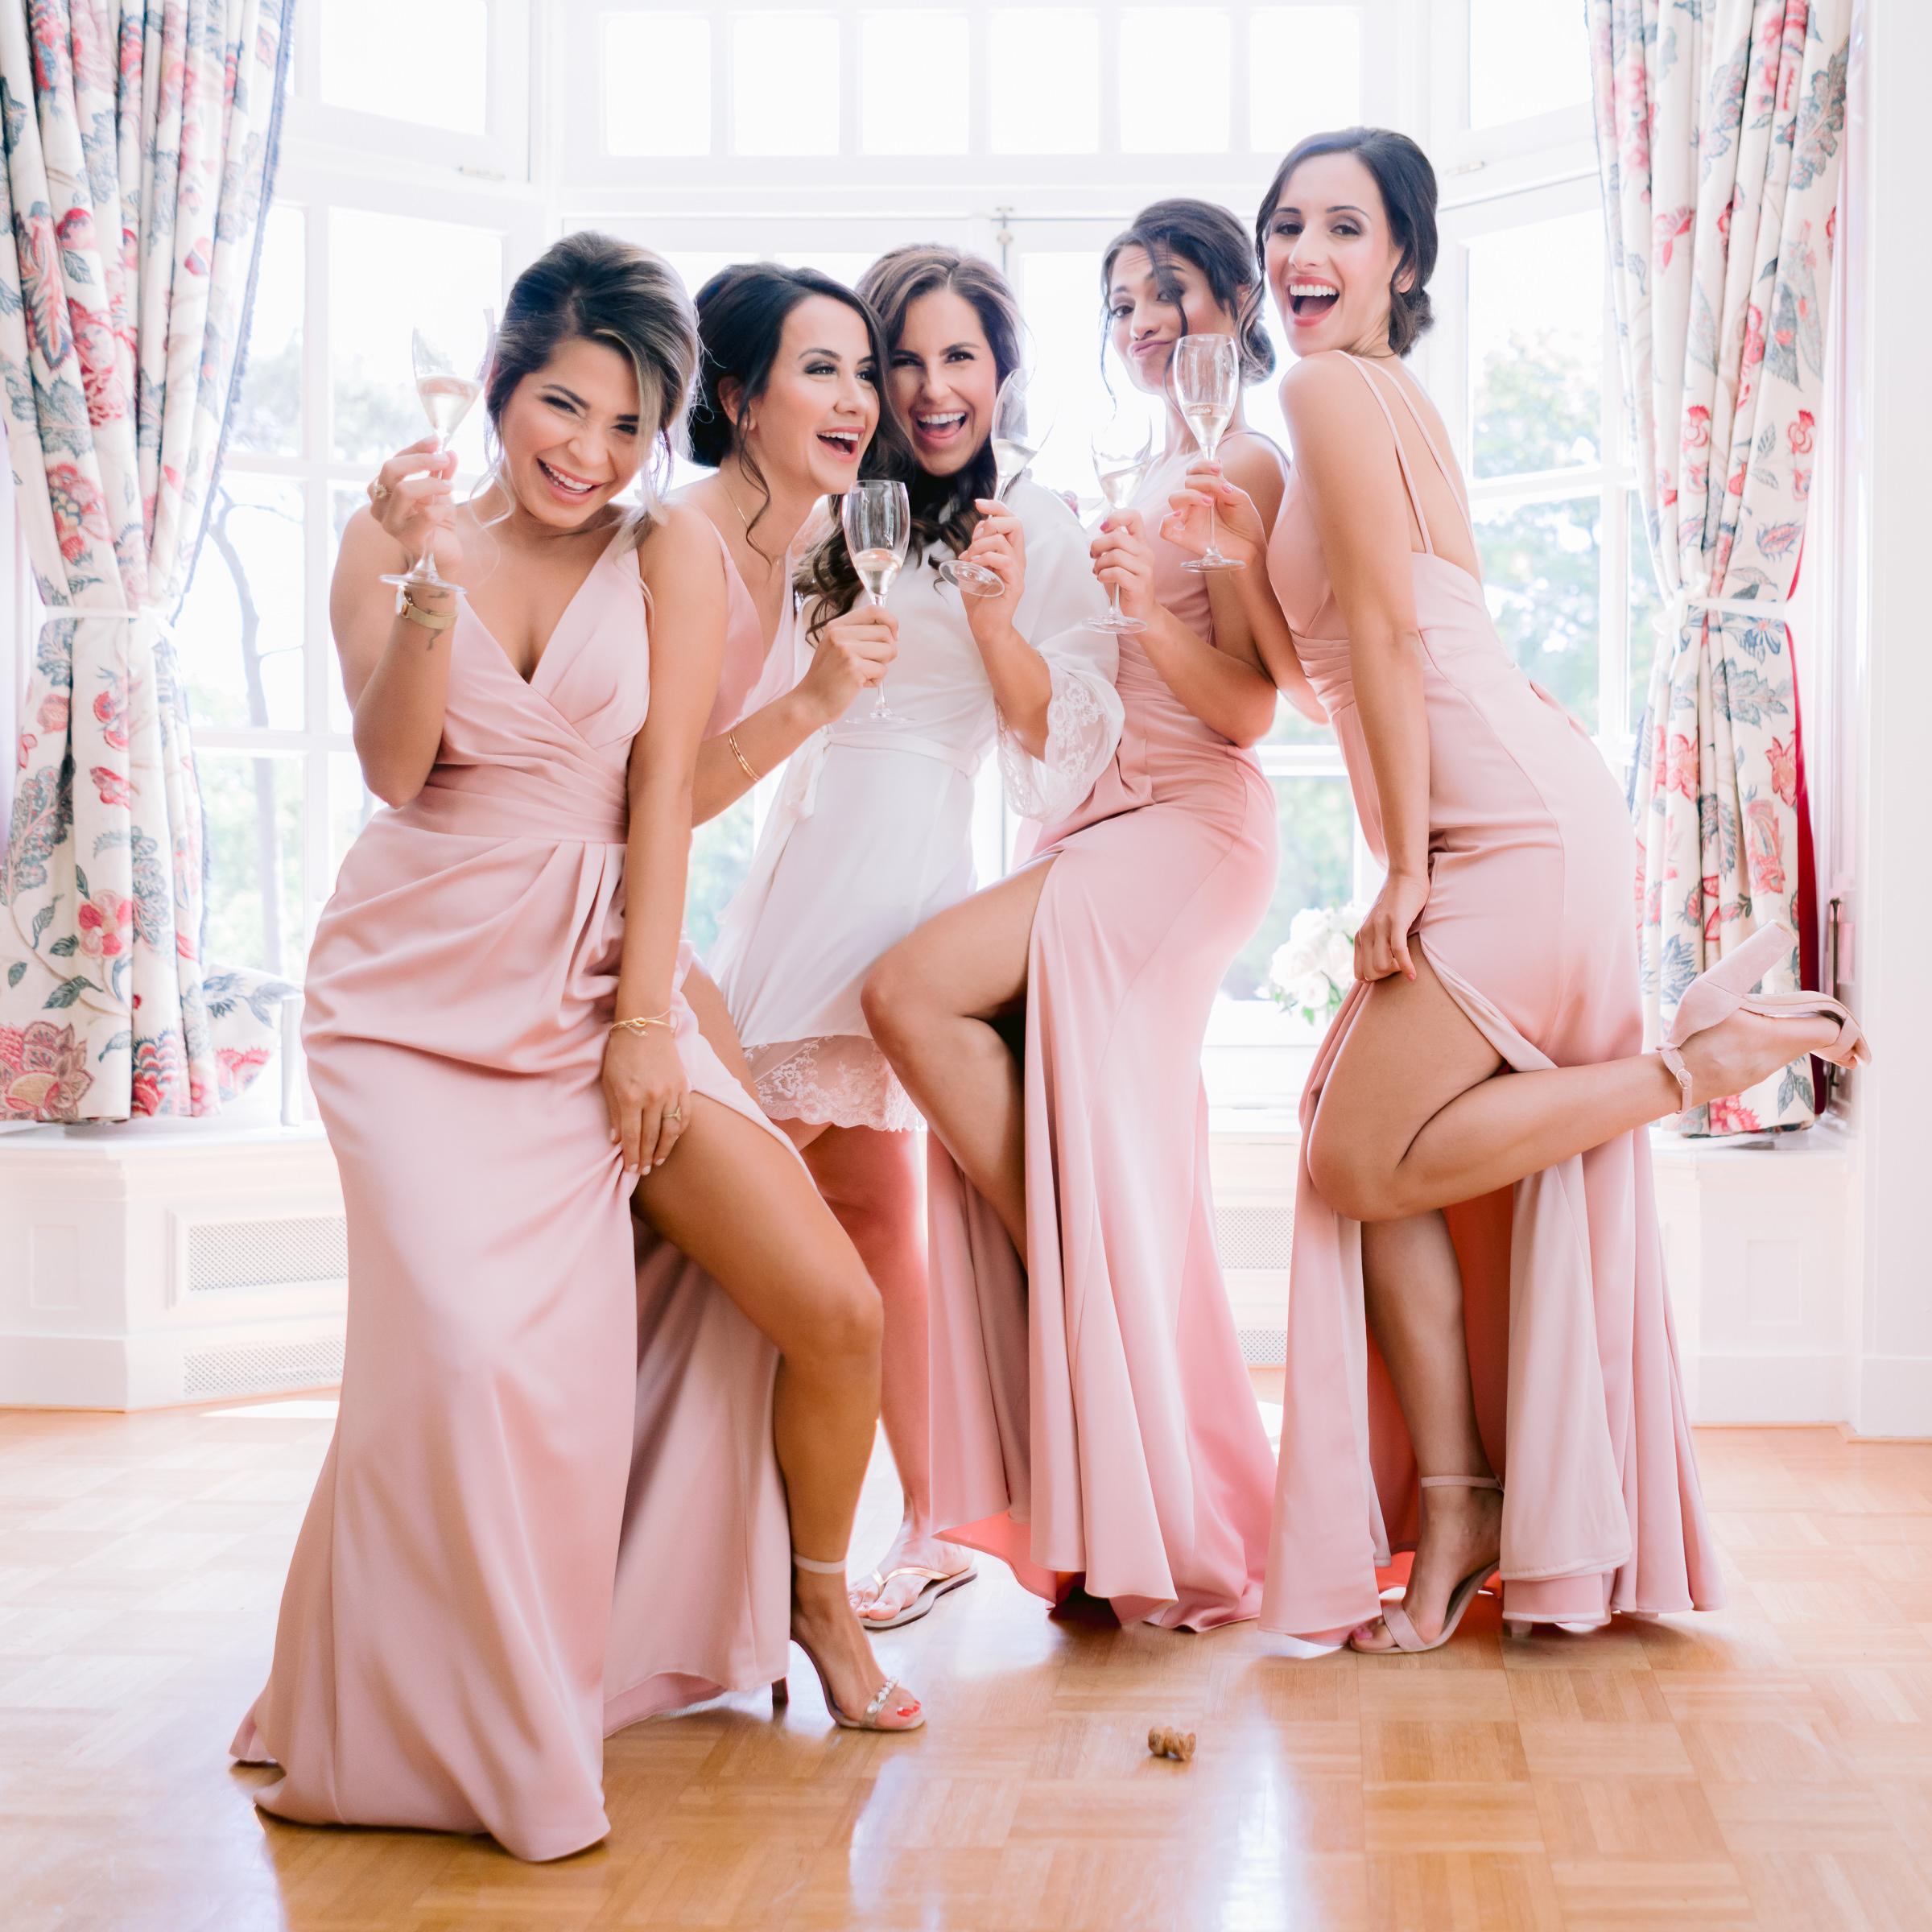 Bridesmaids in pink crepe sleeveless gowns - photo by Peter van der Lingen - Netherlands